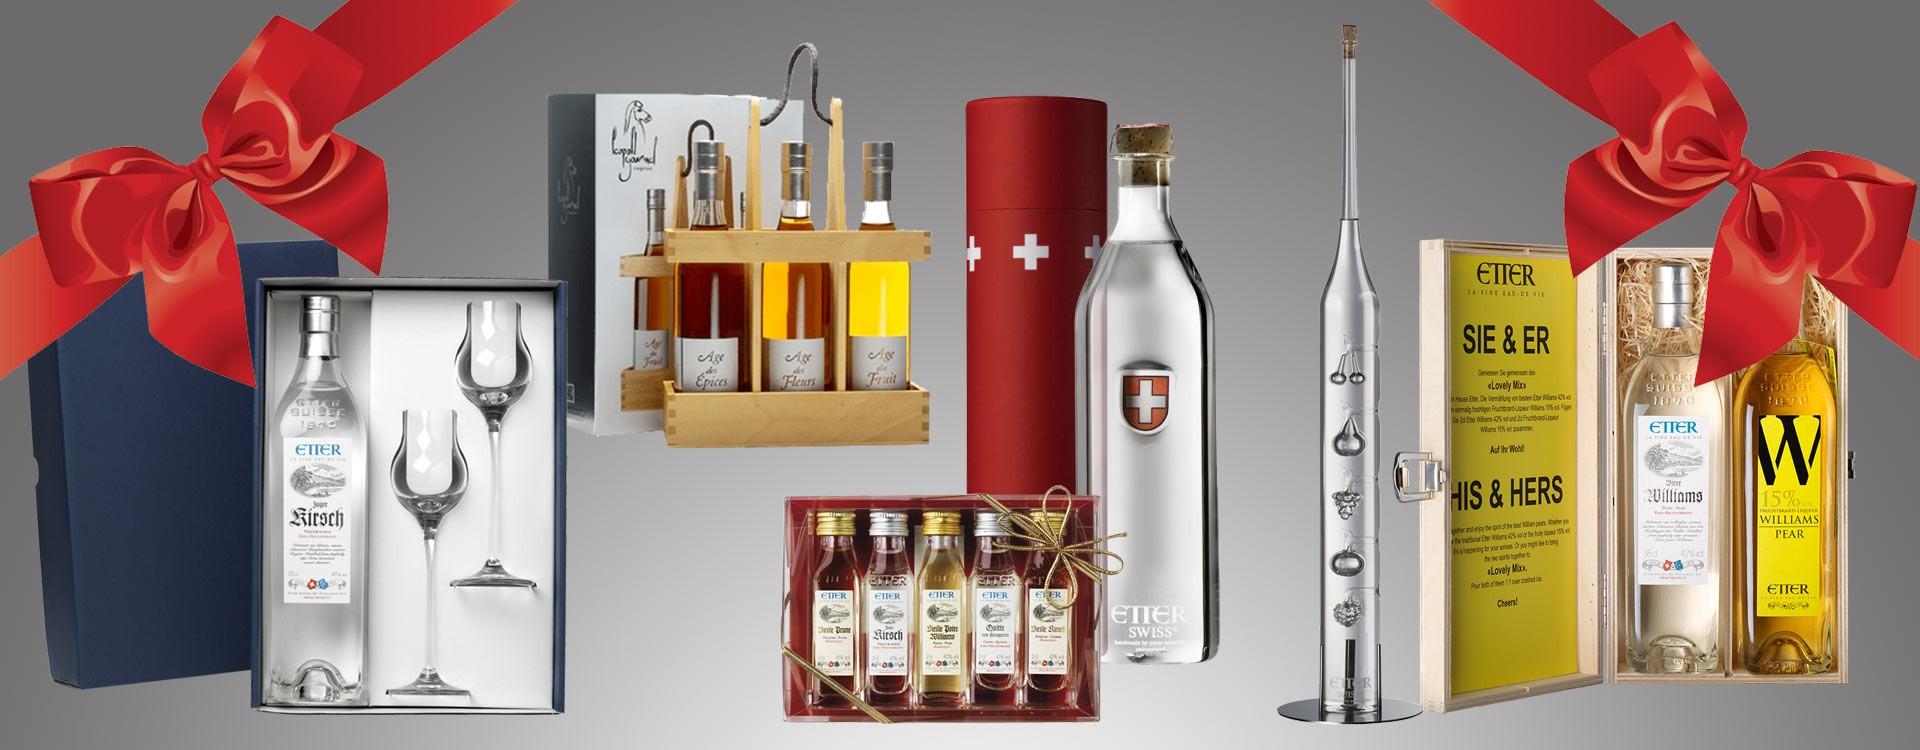 Coffrets Cognac, Kirsch, Liqueurs, Grappa, Rhum